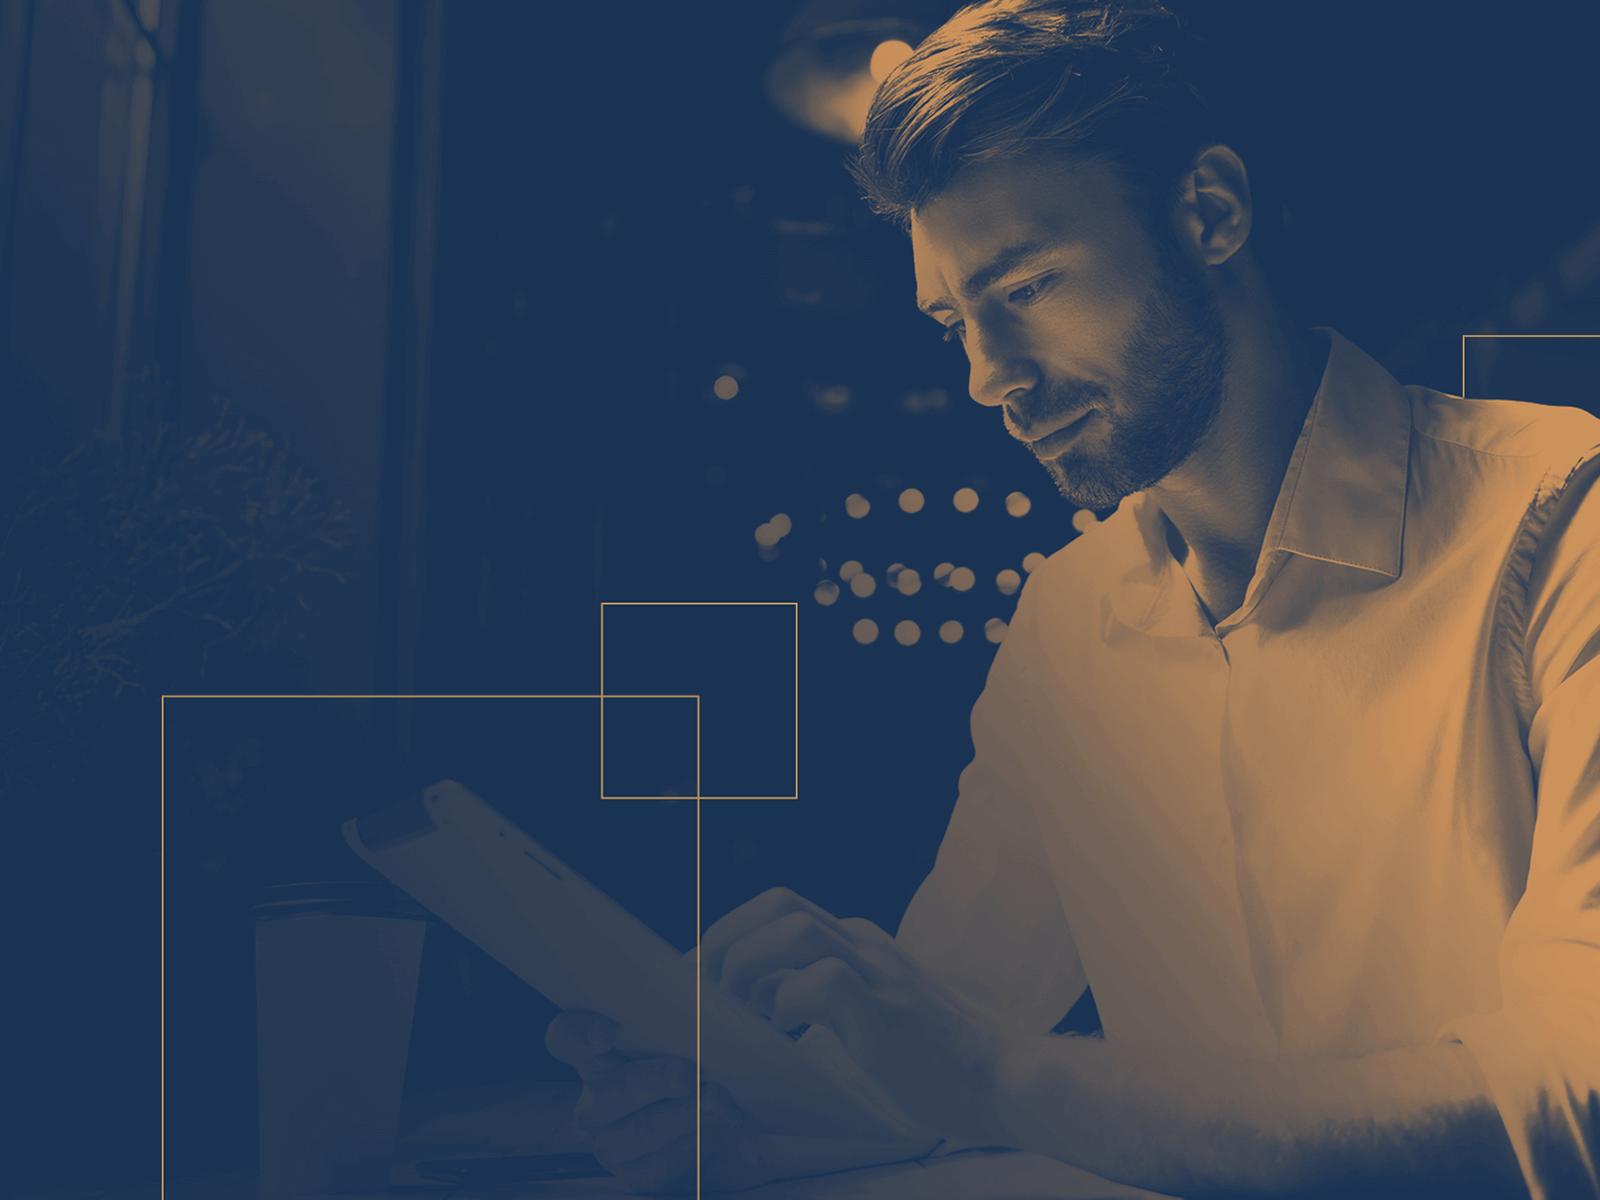 Gartner Magic Quadrant for Web Content Management 2019